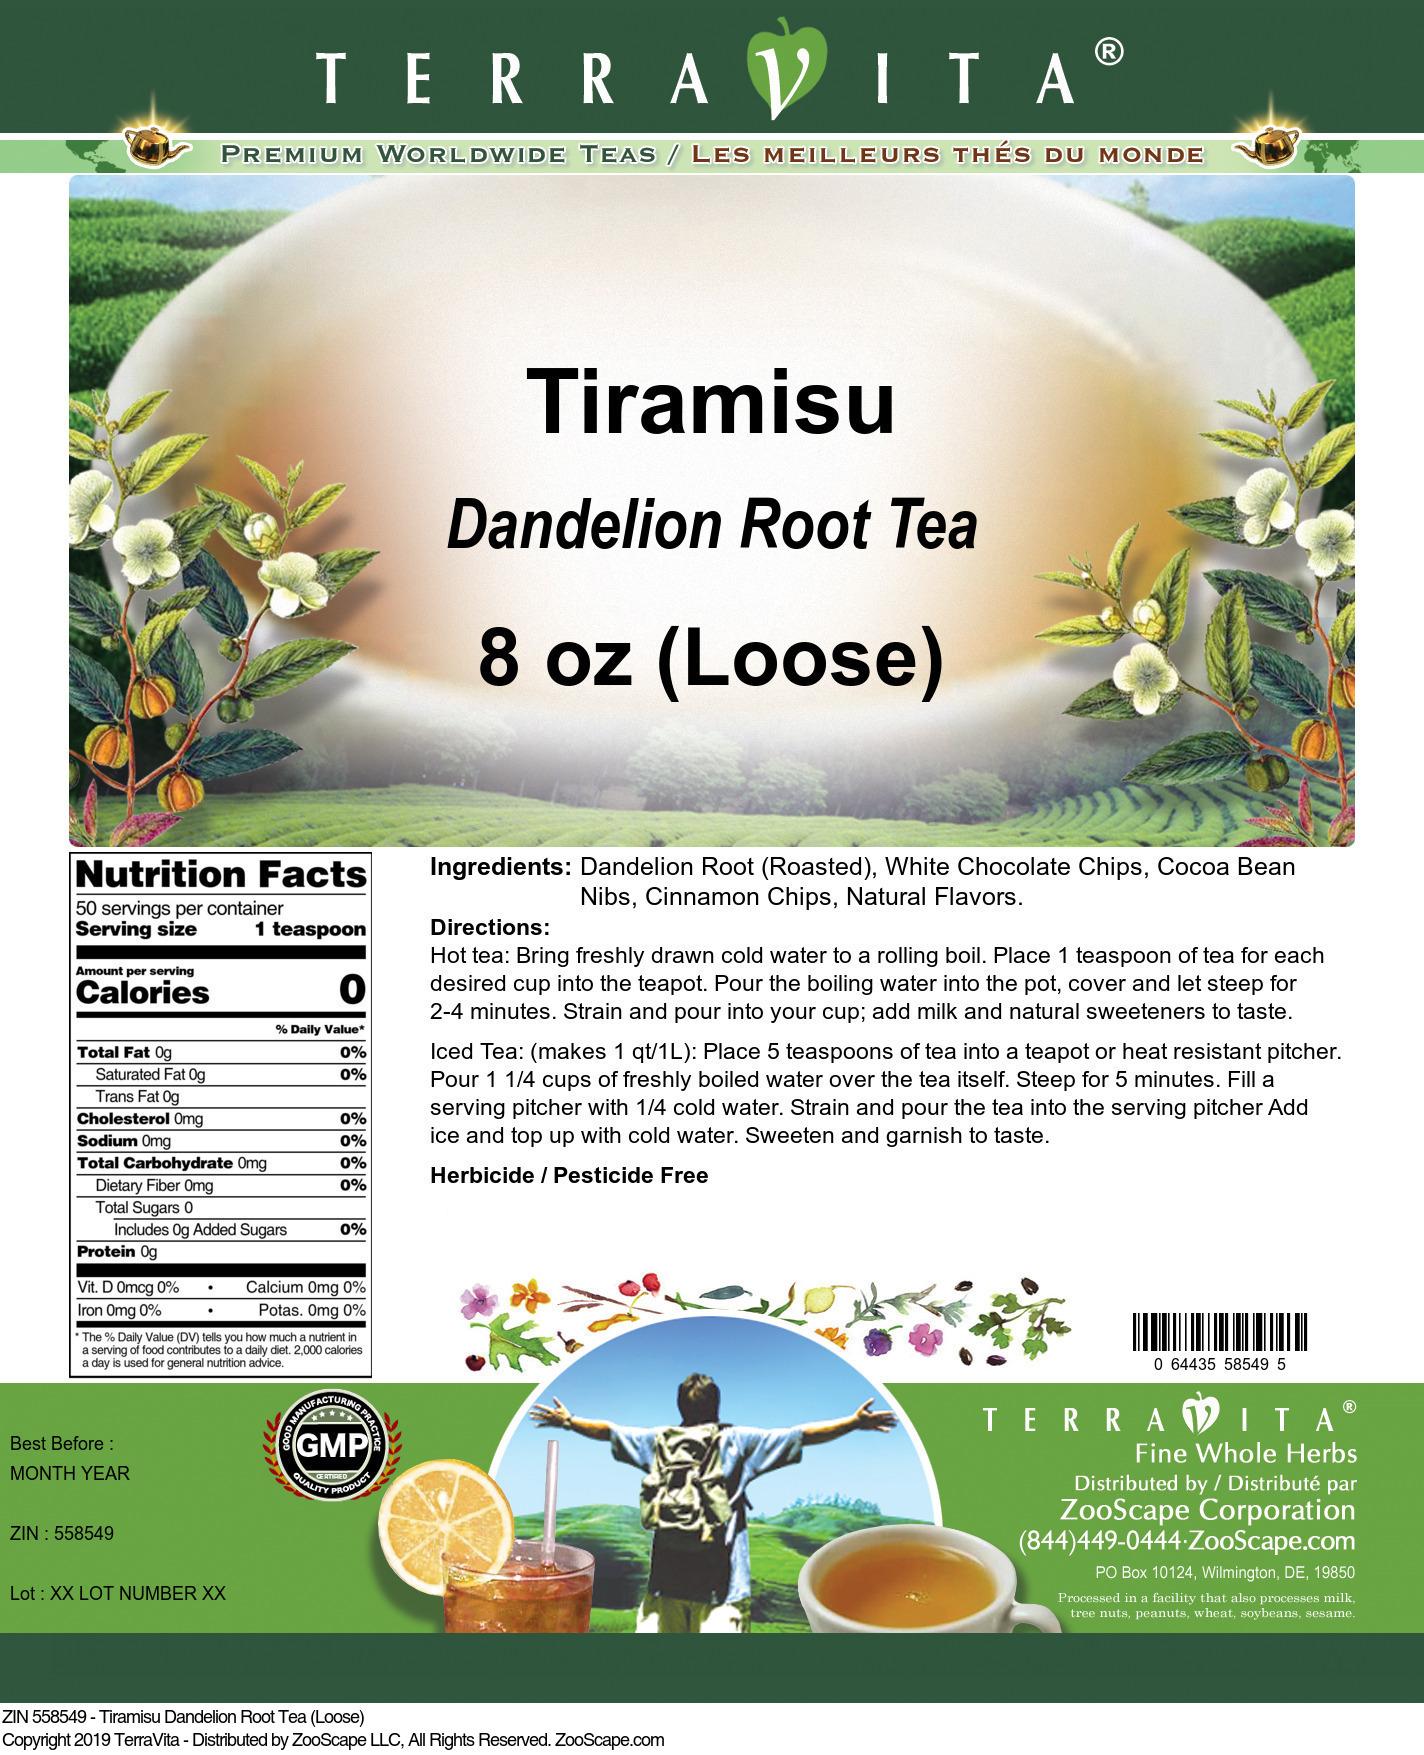 Tiramisu Dandelion Root Tea (Loose)